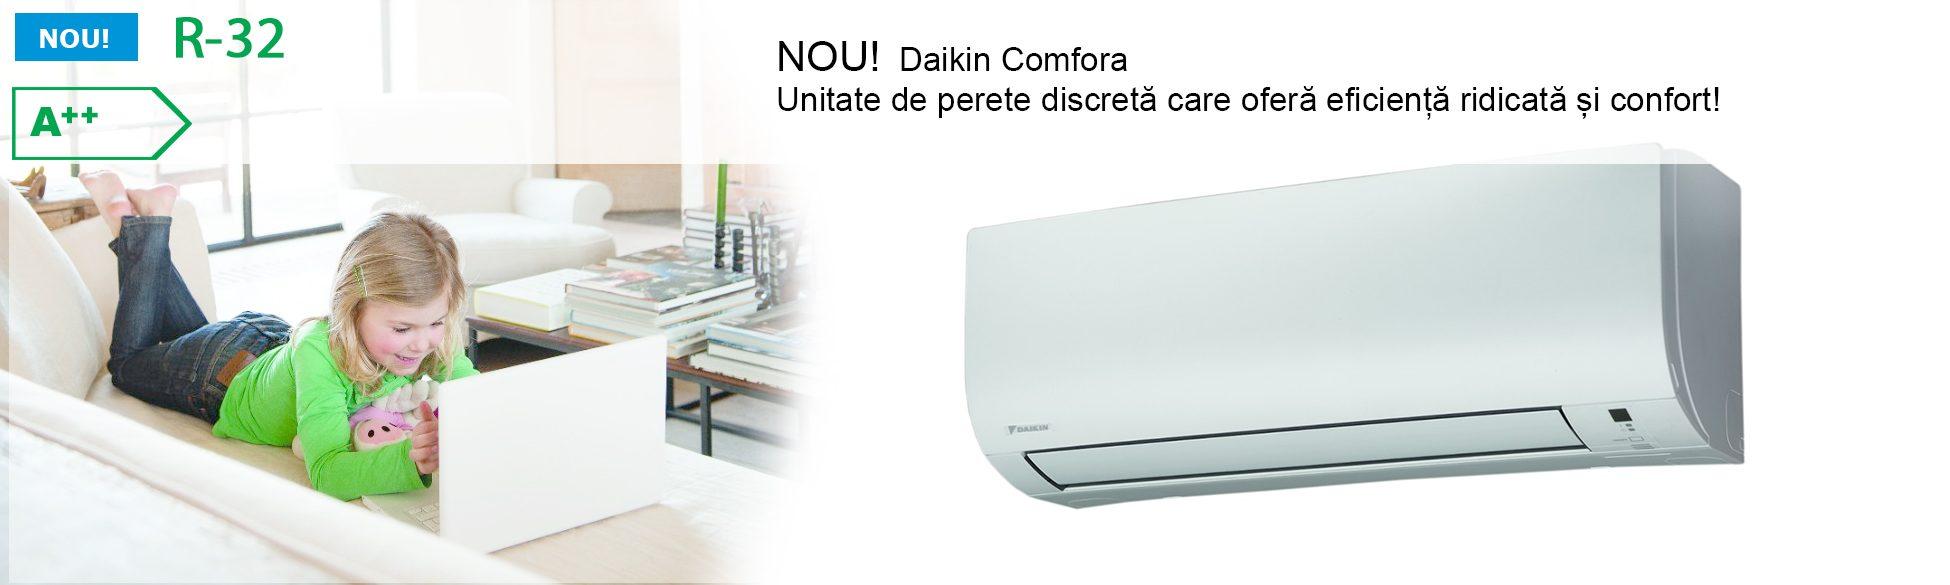 Comfora Daikin-FTXP-L